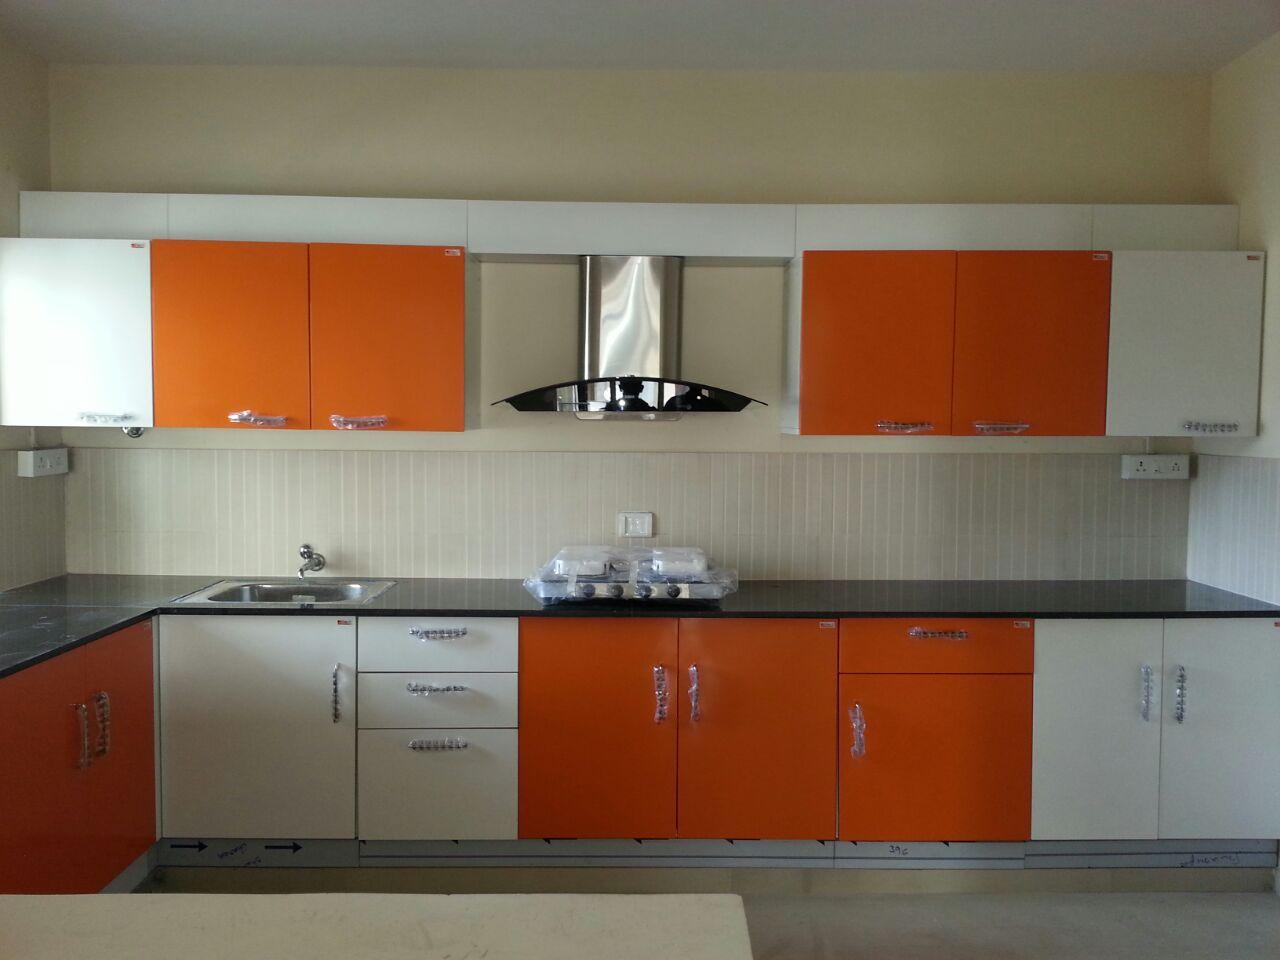 Parallel kitchen design by Tony Thomas Modular-kitchen Contemporary | Interior Design Photos & Ideas